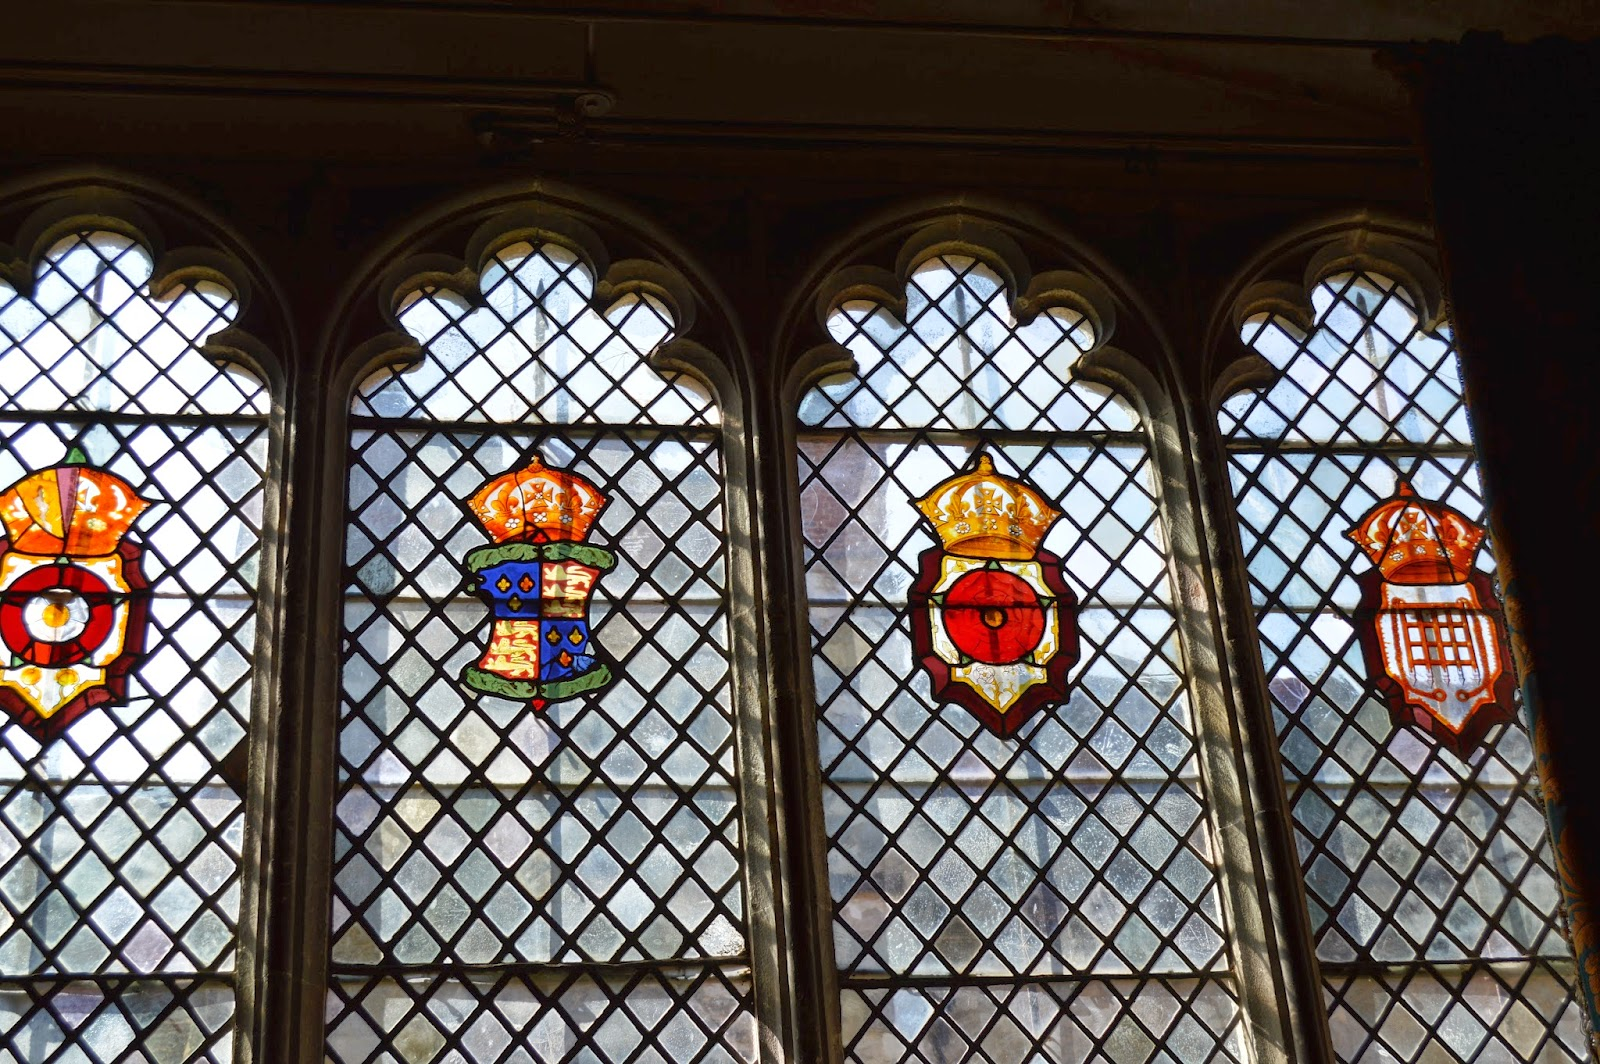 Ightham Mote, visit, England, History, Historical, interior, day trip, National trust, photo, photography, Medieval, Tudor, windows, diamond